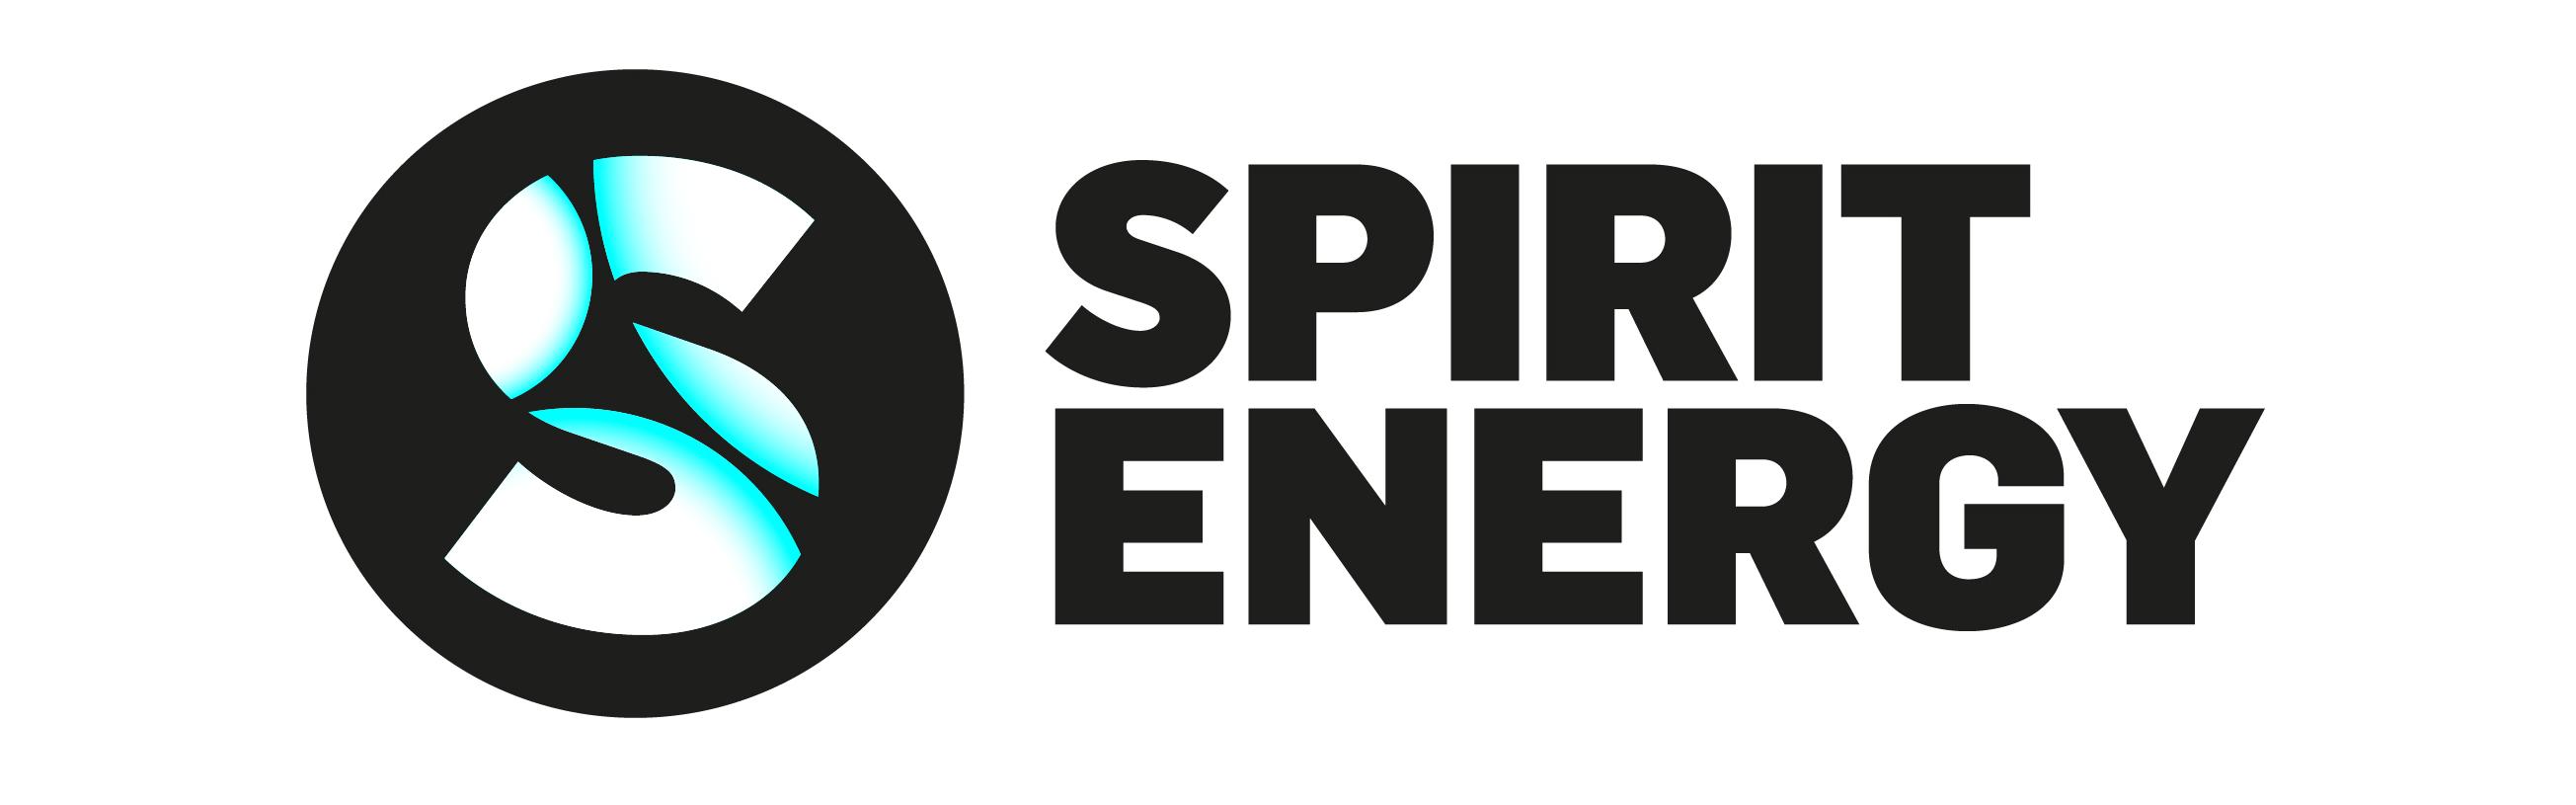 Spirit Energy company logo